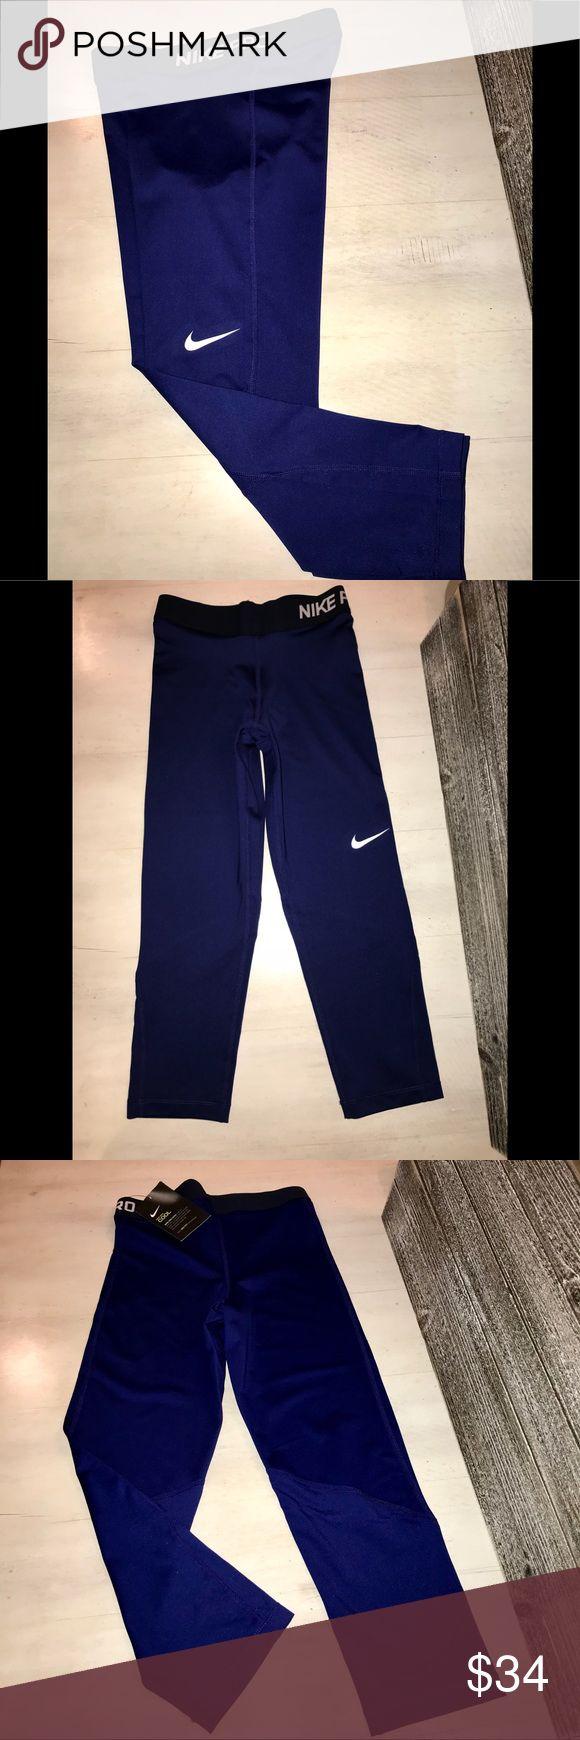 NWT! WOMENS NIKE PRO COOL DRI-FIT TR CAPRI'S ! NWT !!!  NIKE PRO COOL women's  training leggings with elastic waistband   SIZE: XS  COLOR:   BEAUTIFUL ROYAL BLUE ! Nike Pants Leggings